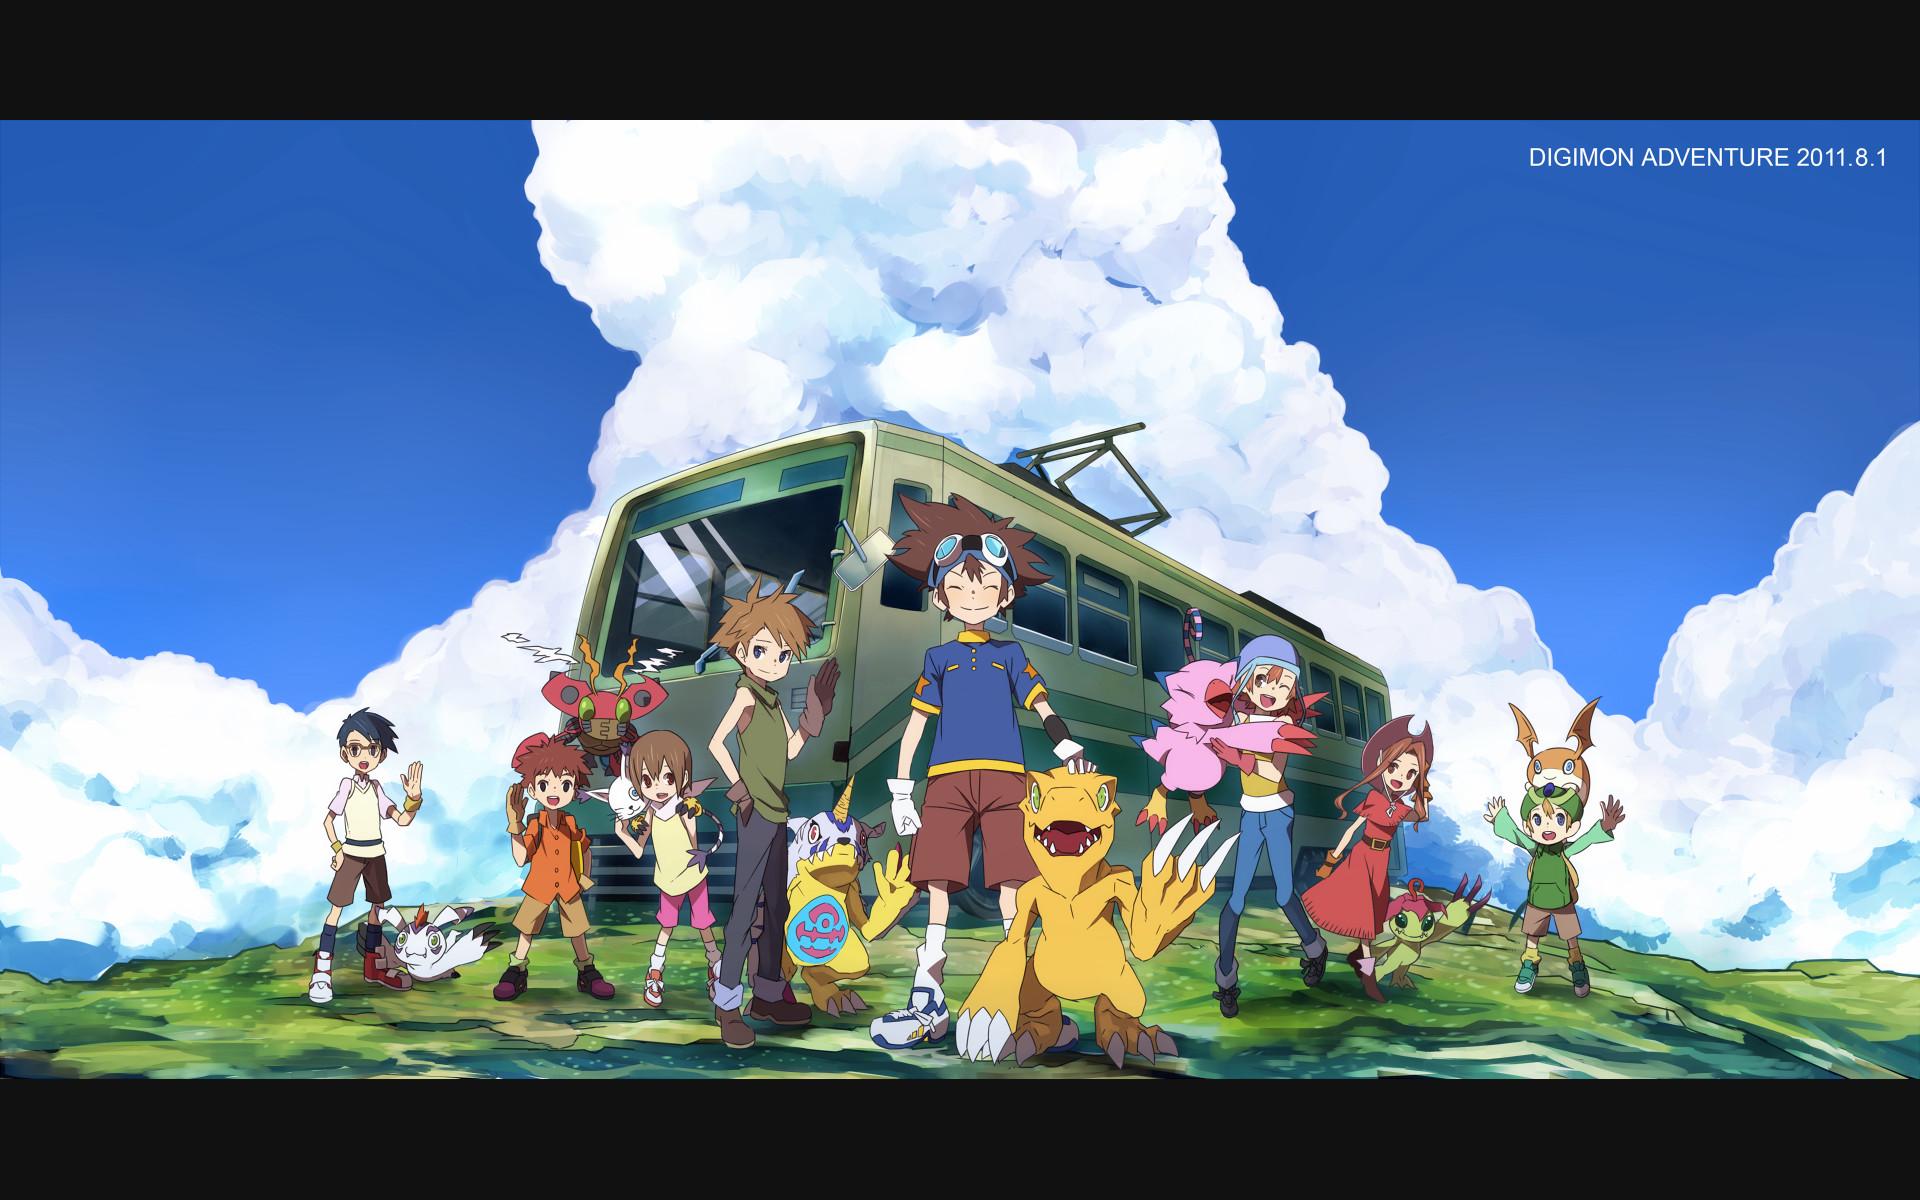 Res: 1920x1200, Digimon Adventure Wallpaper